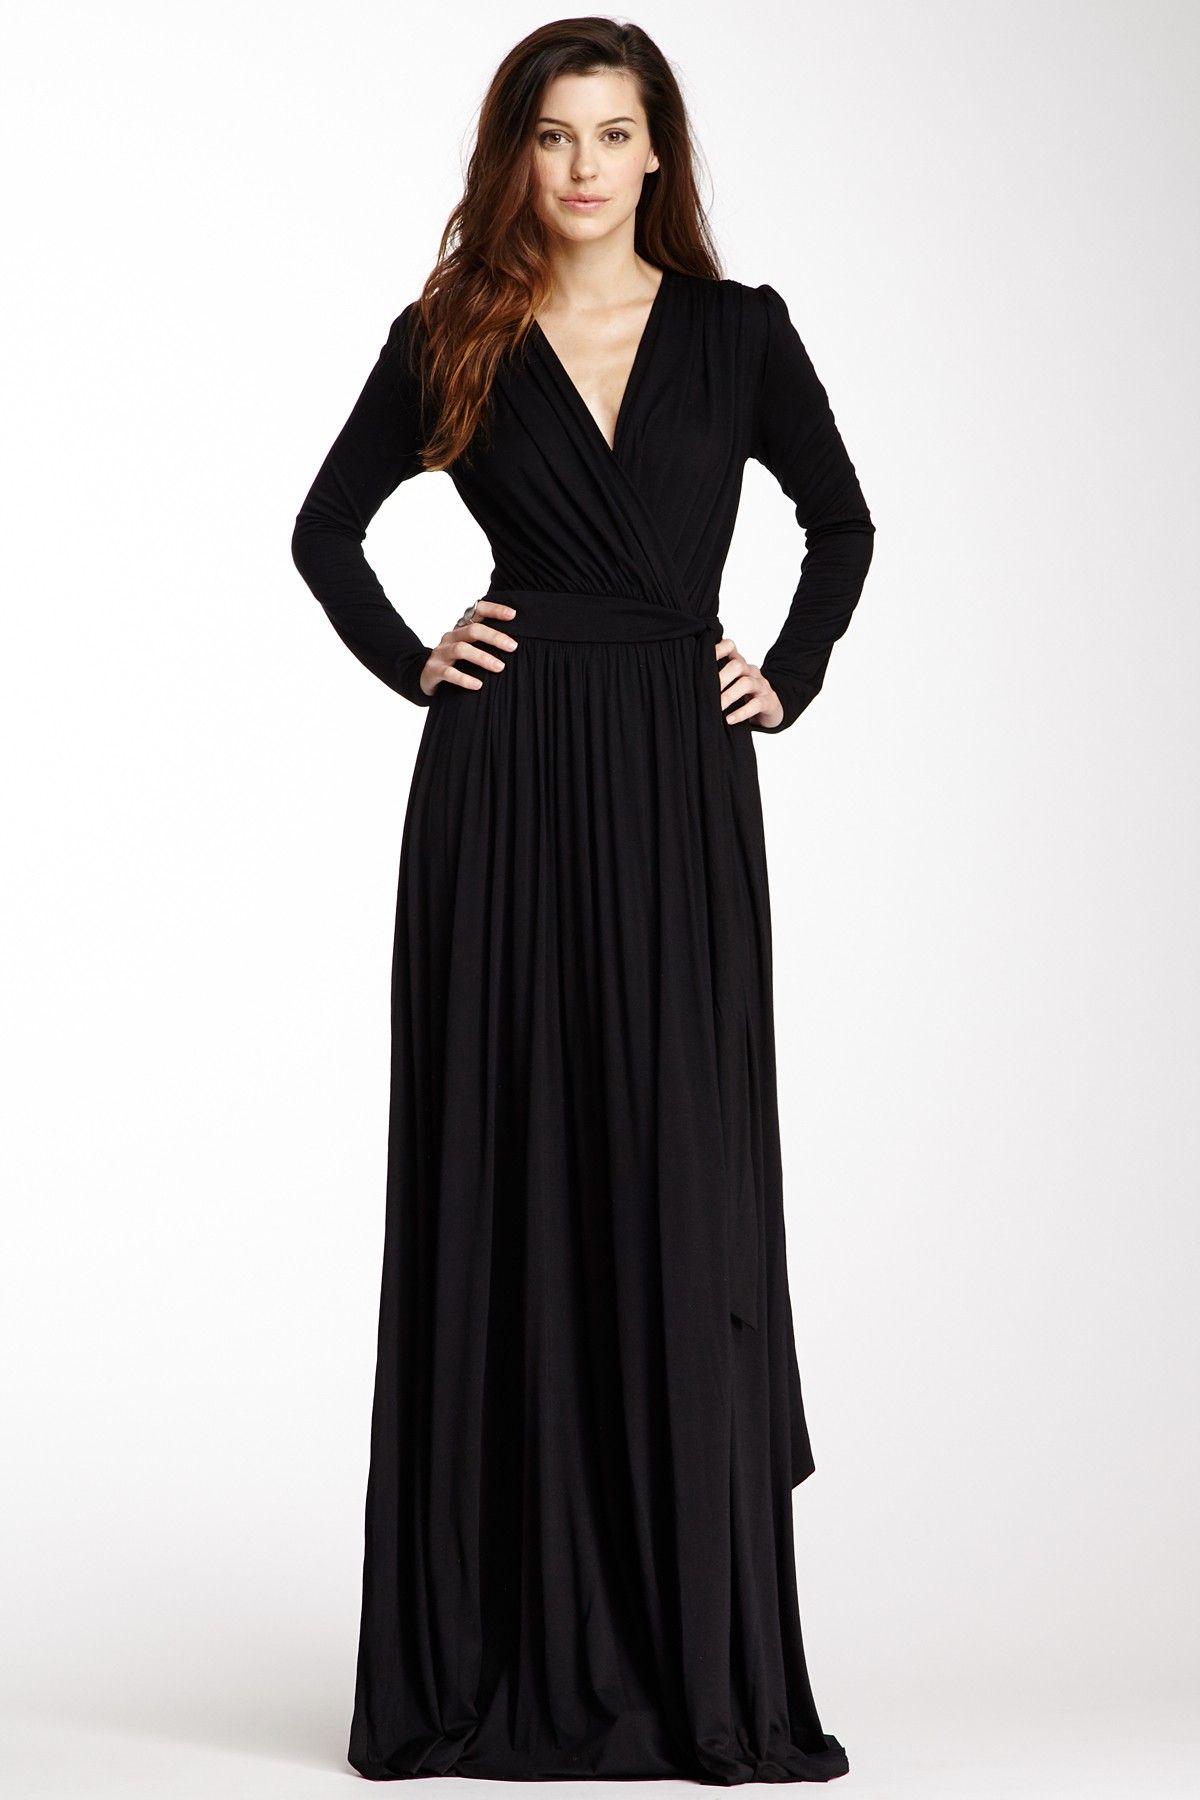 Maxi Wrap Dress Long Sleeve Black Wrap Dress Maxi Skirt Dress Dresses [ 1800 x 1200 Pixel ]